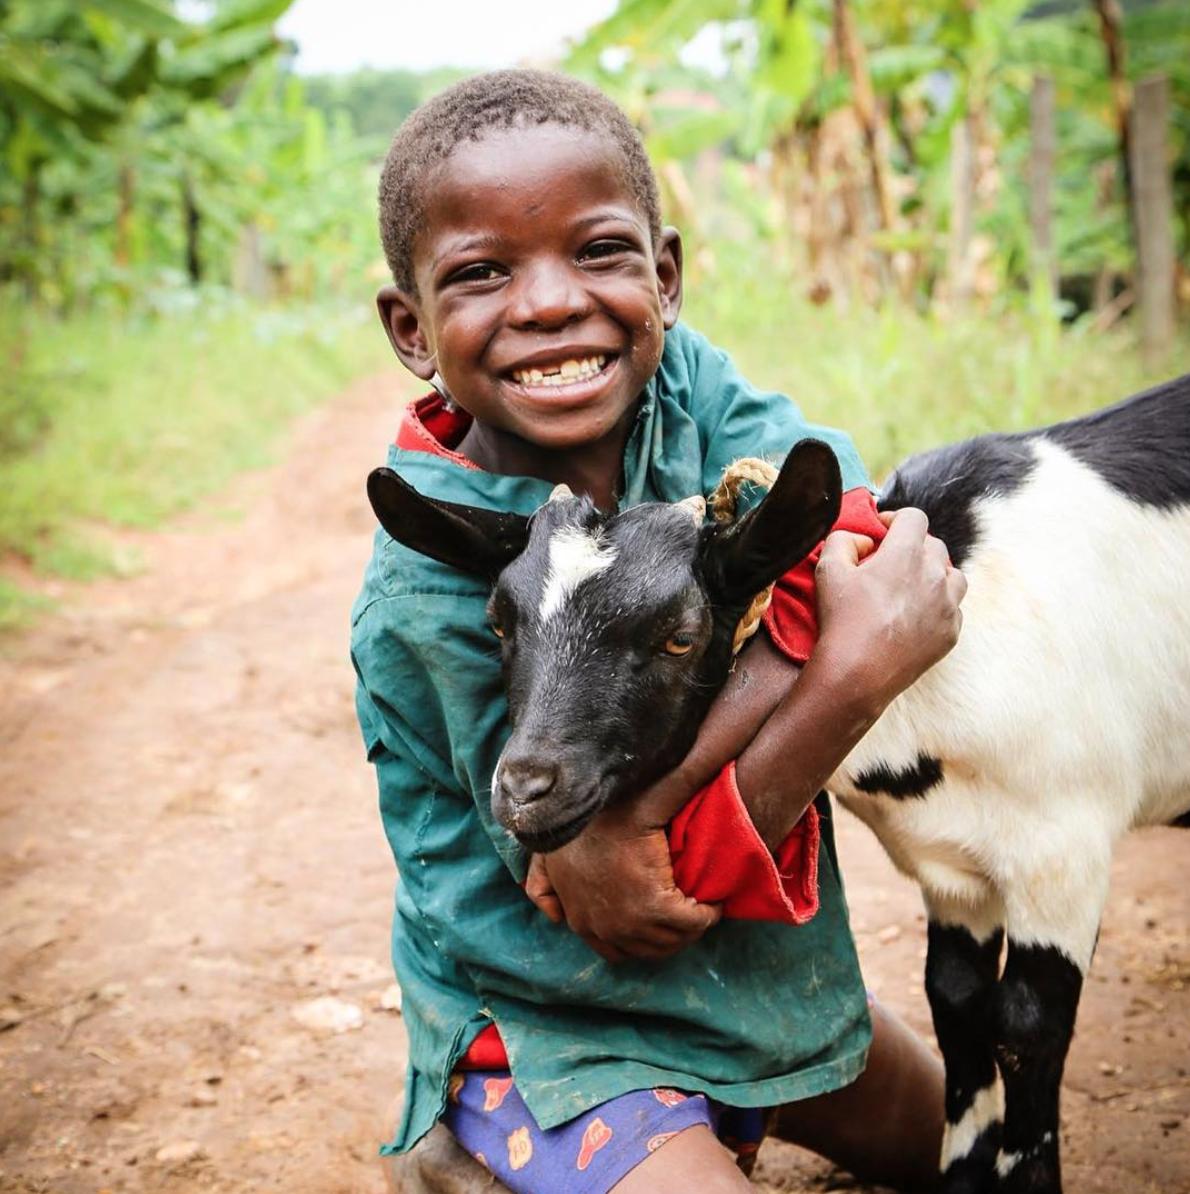 Kenyan boy hugs a goat